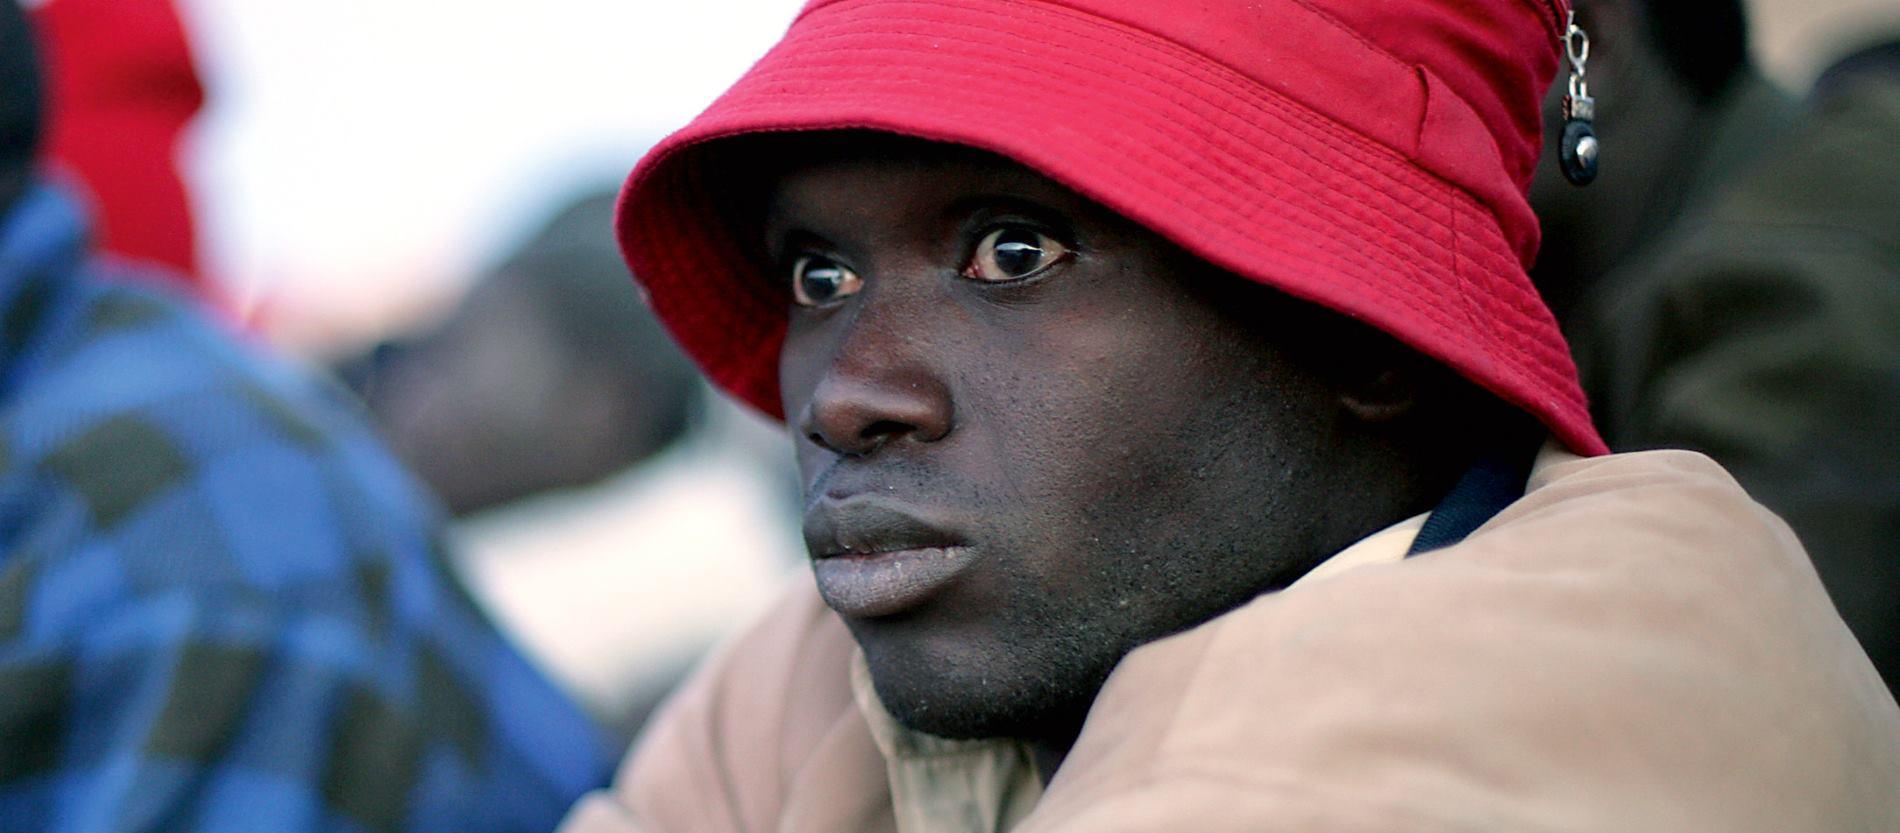 EKONOMSKI MIGRANTI: Njemačka pooštrava zakon o azilu